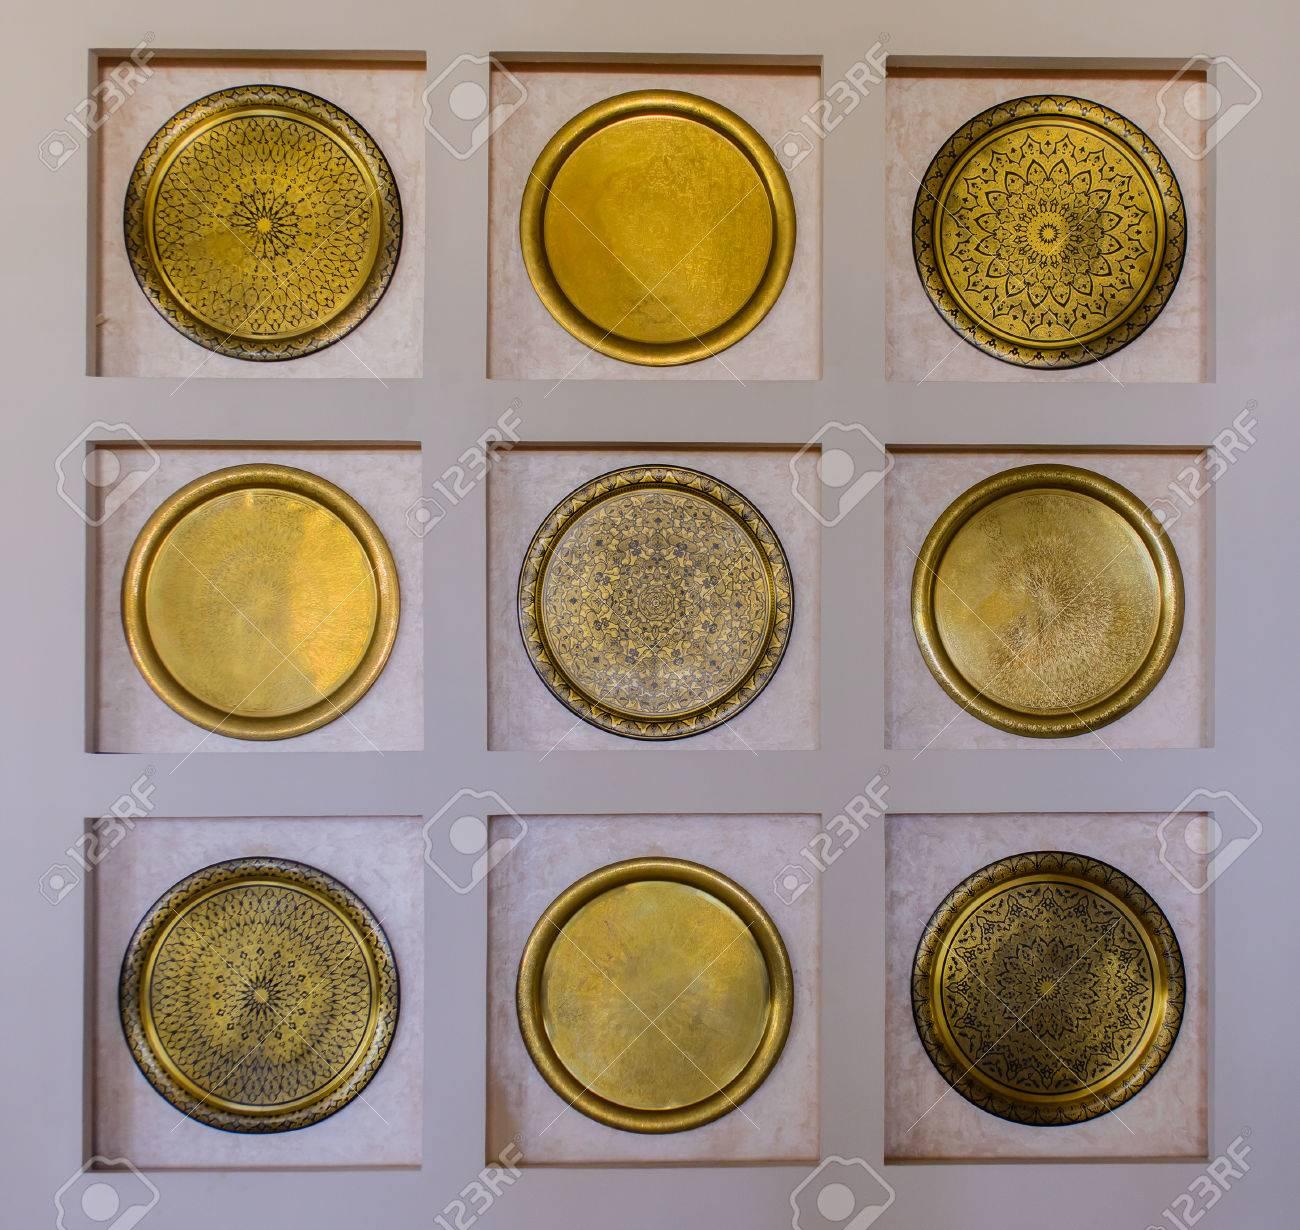 Interior Decor Of A Set Of Nine Ornate Round Brass Wall Plates